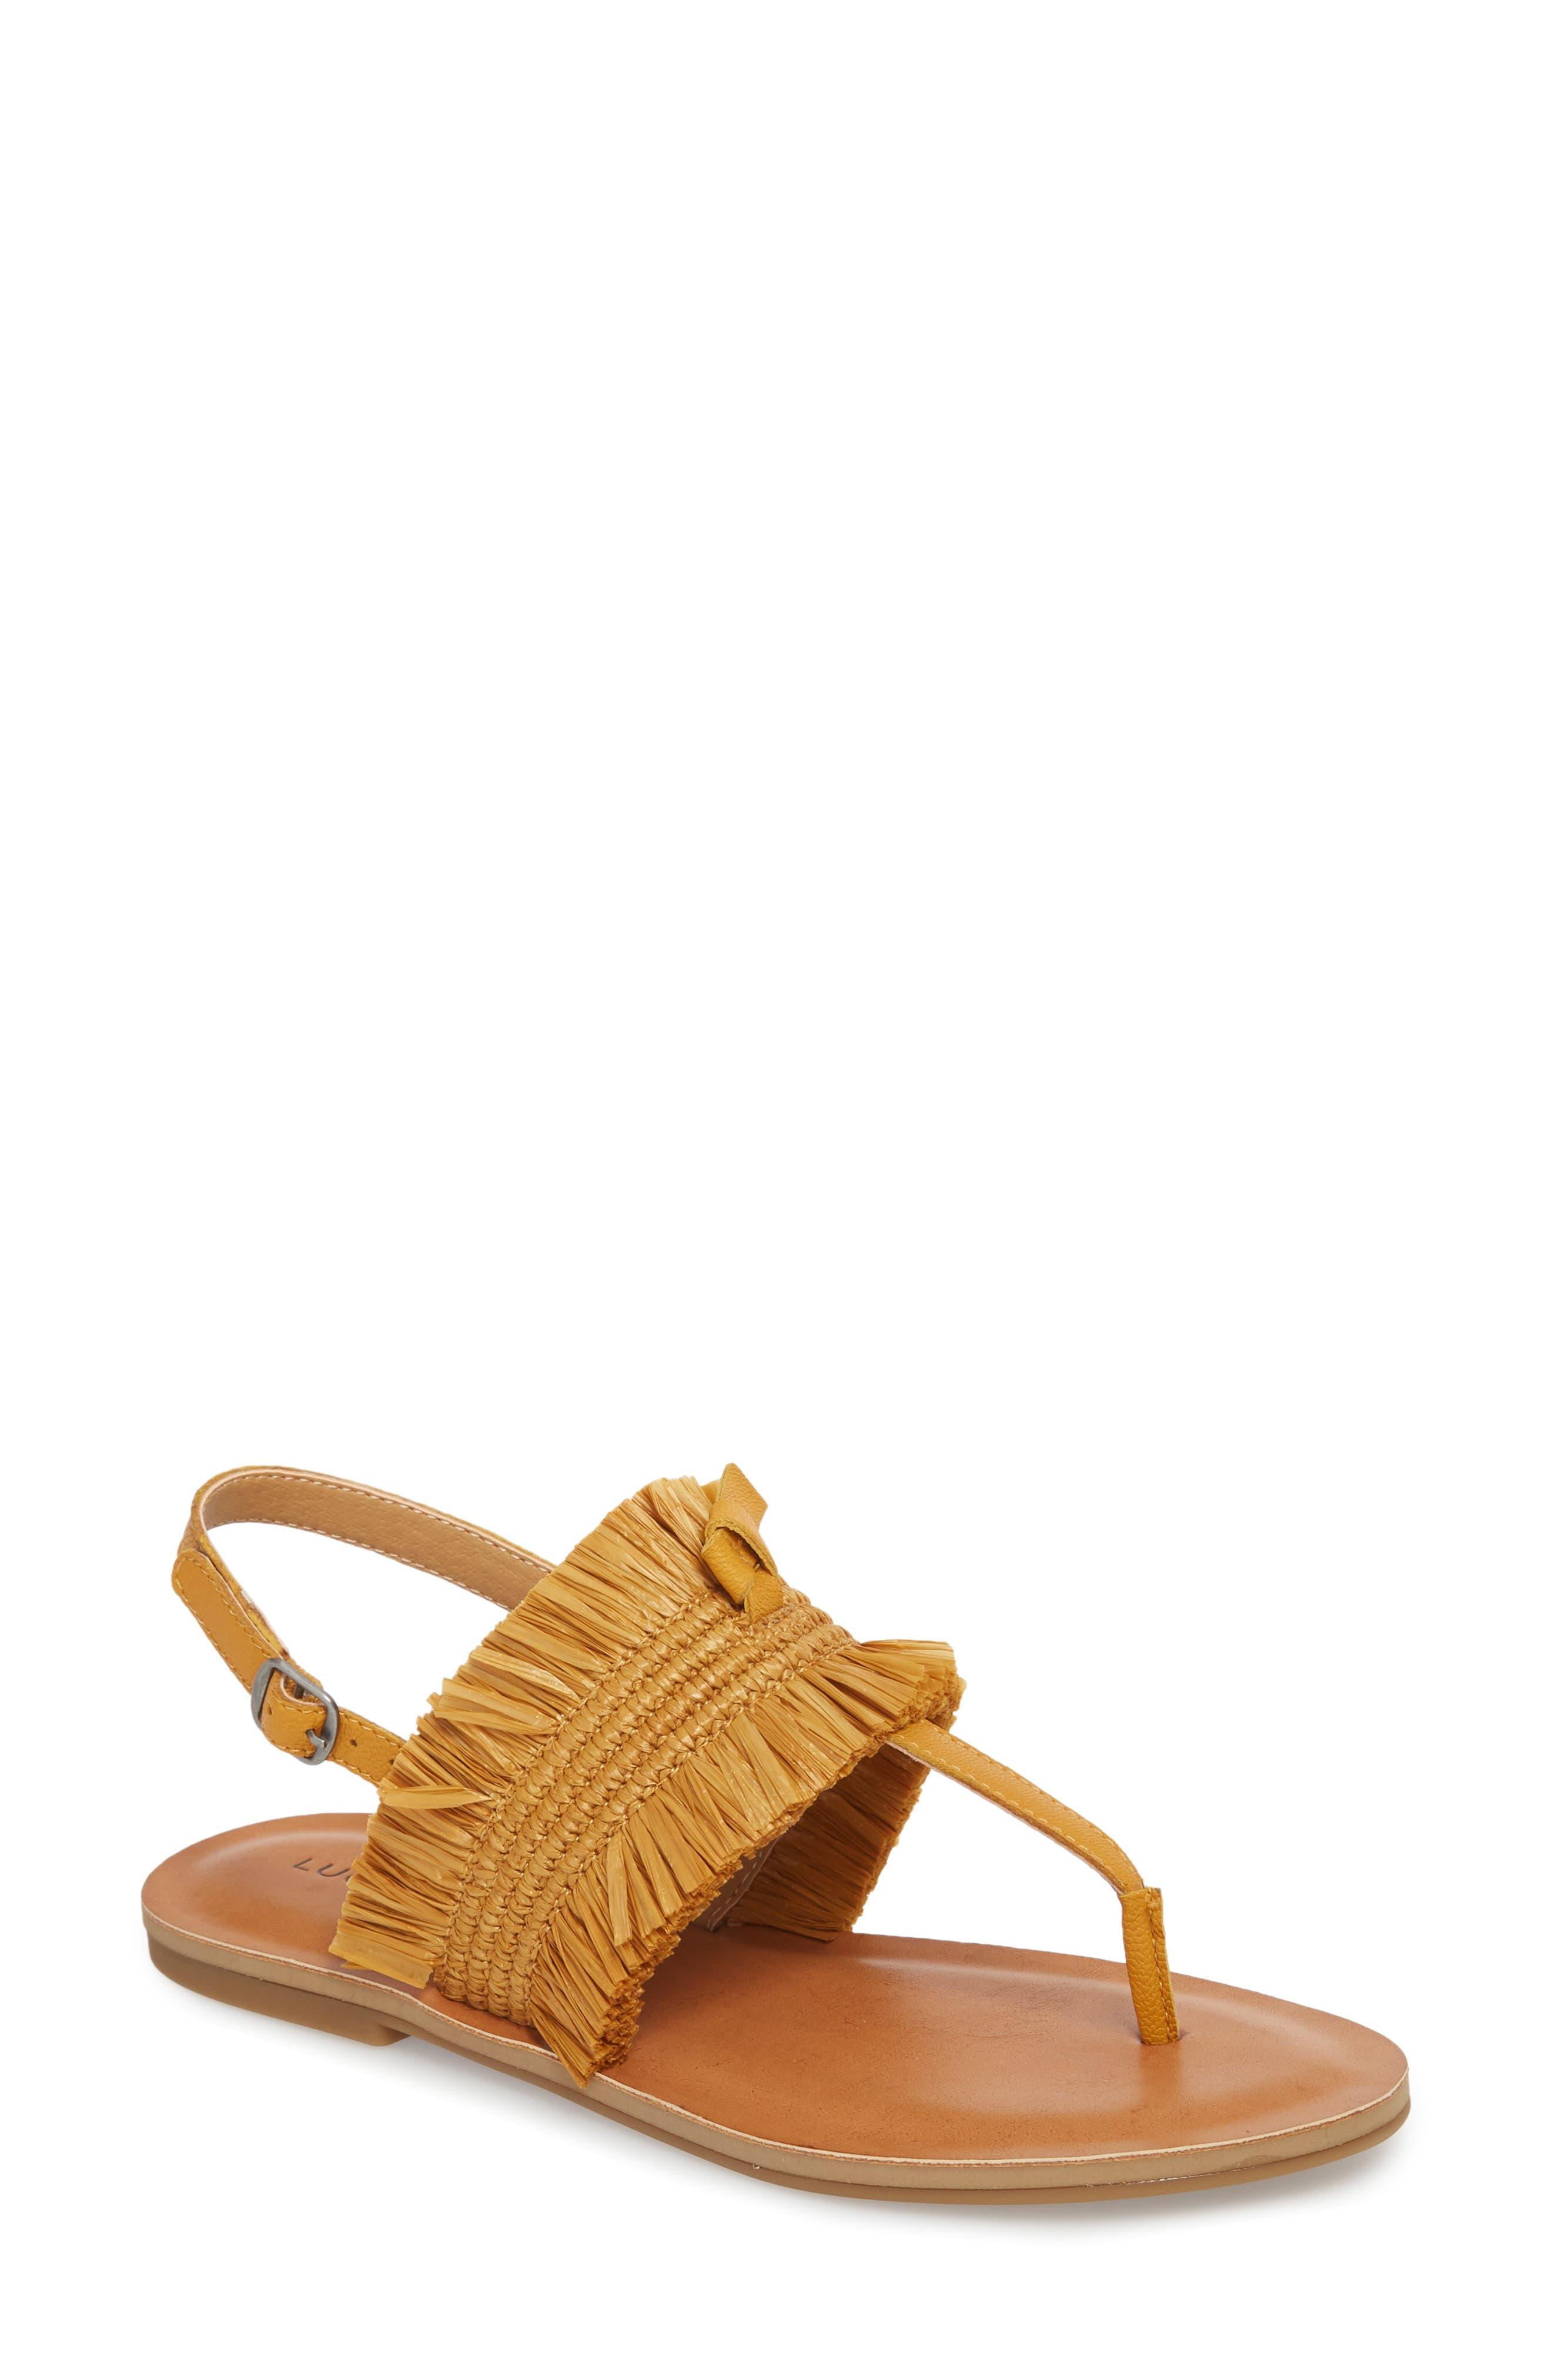 Akerlei Sandal,                             Main thumbnail 1, color,                             Saffron Leather